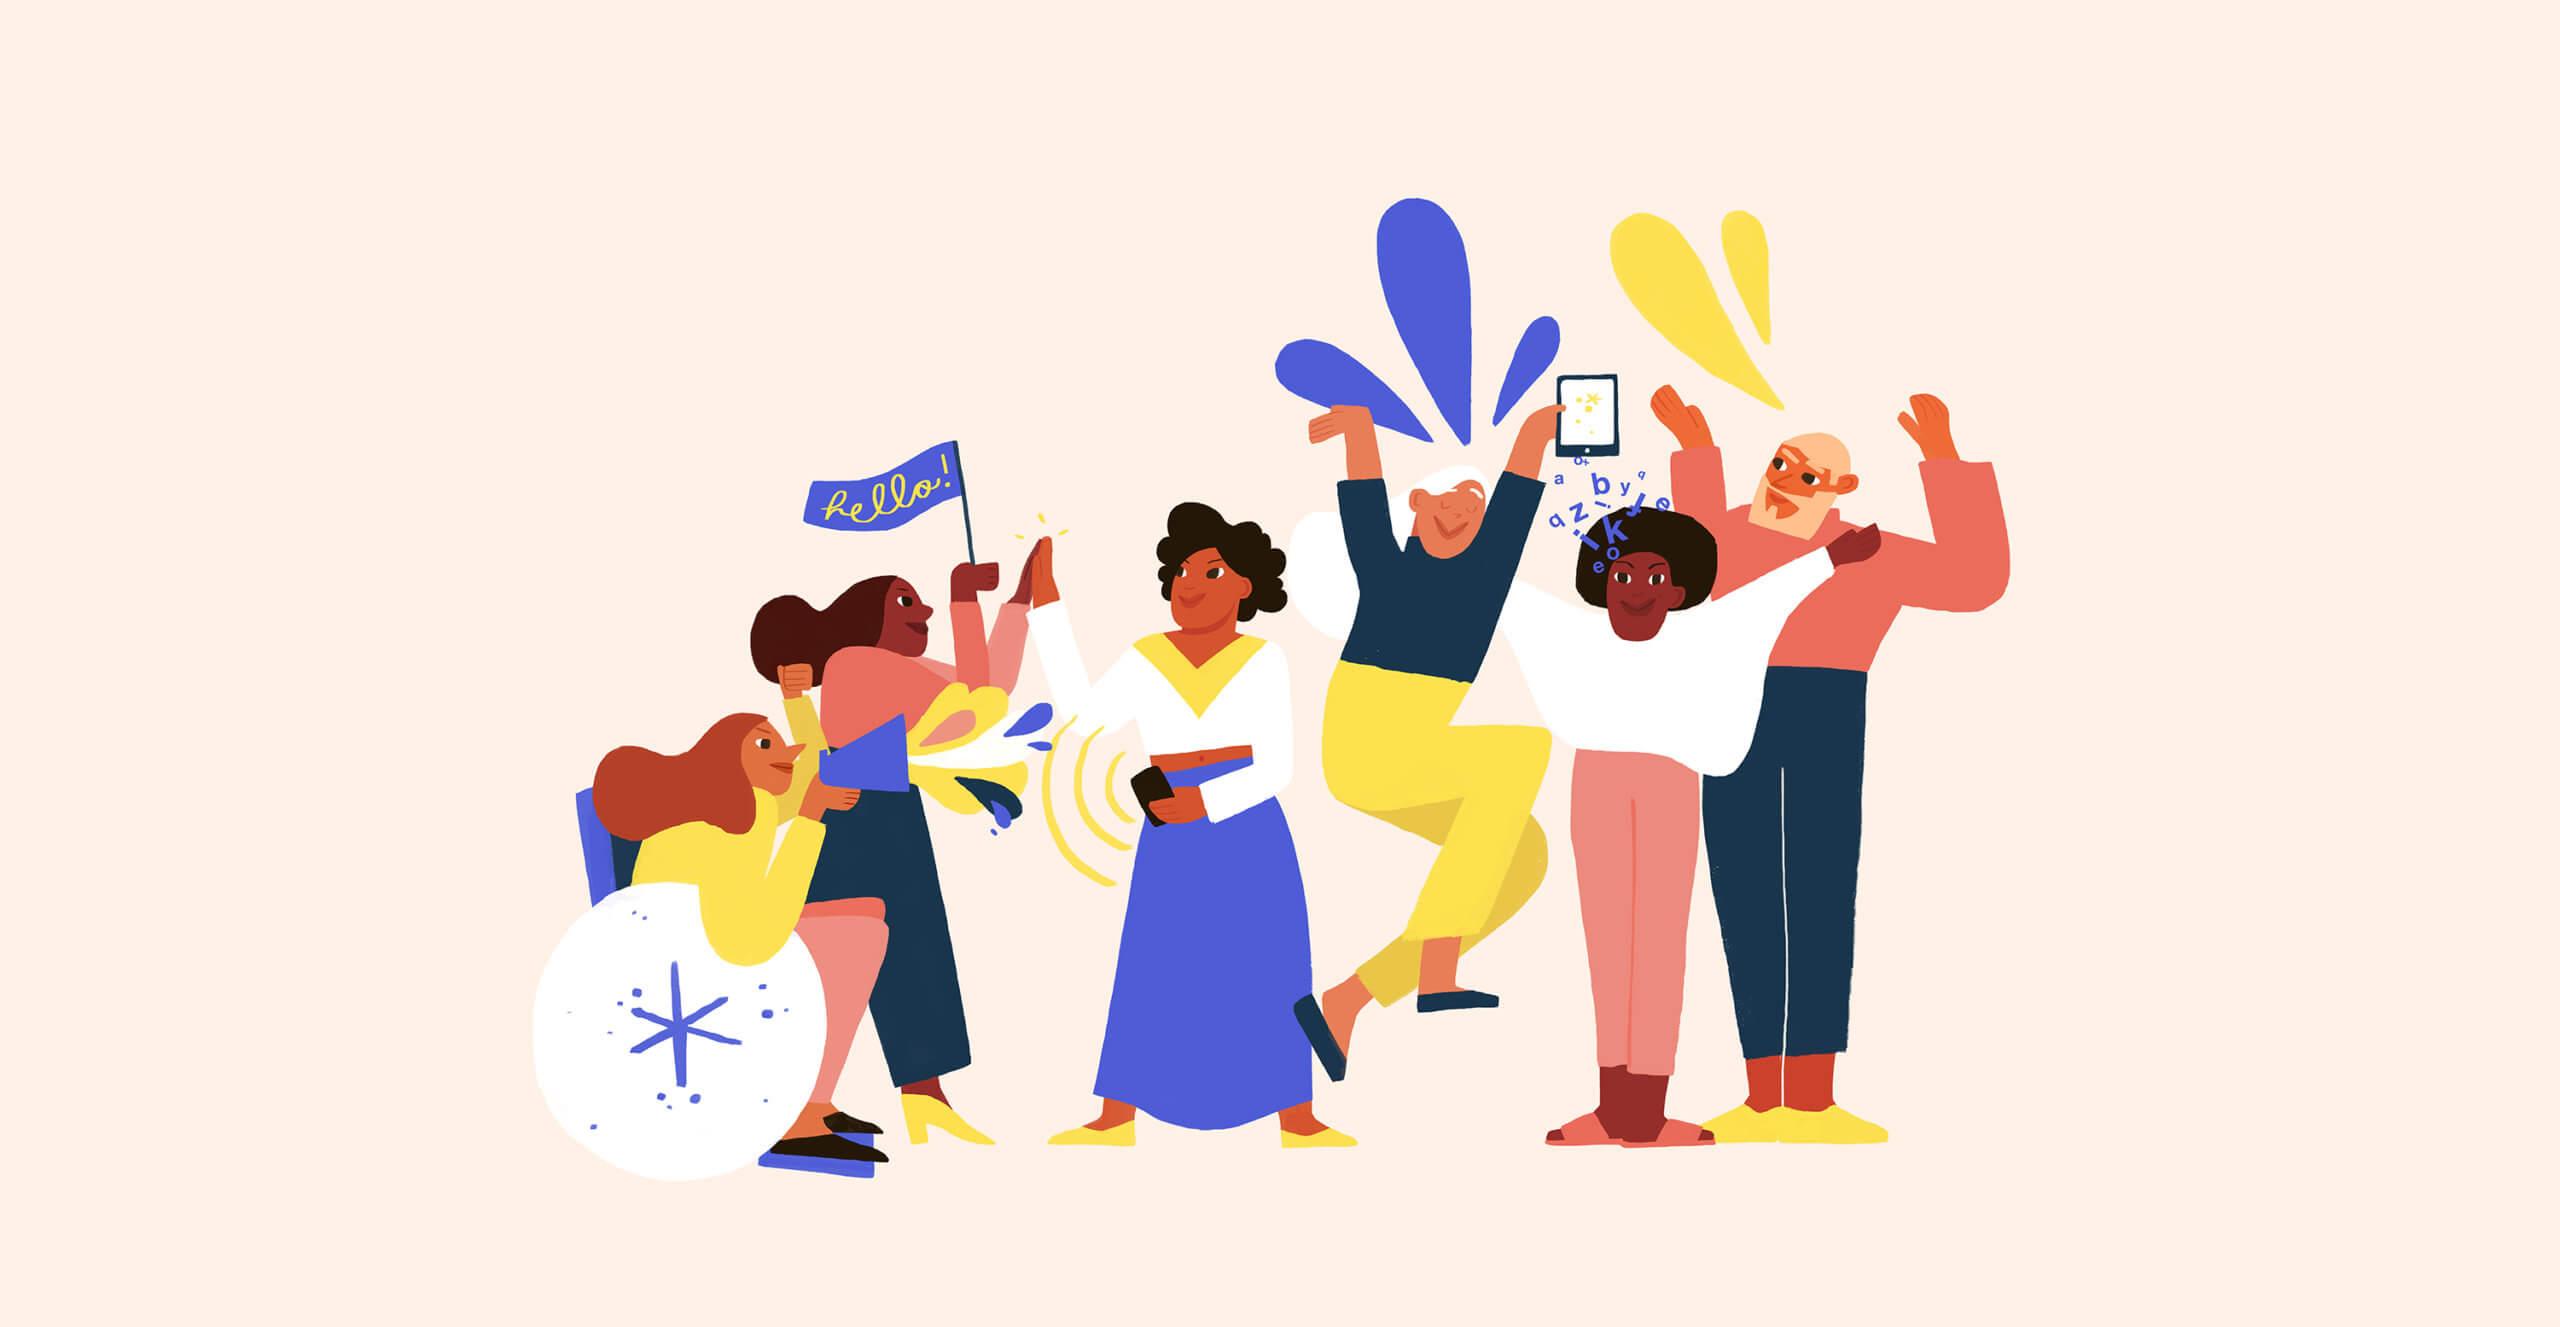 people-community-communication-together-hero-illustration-violeta-noy-3